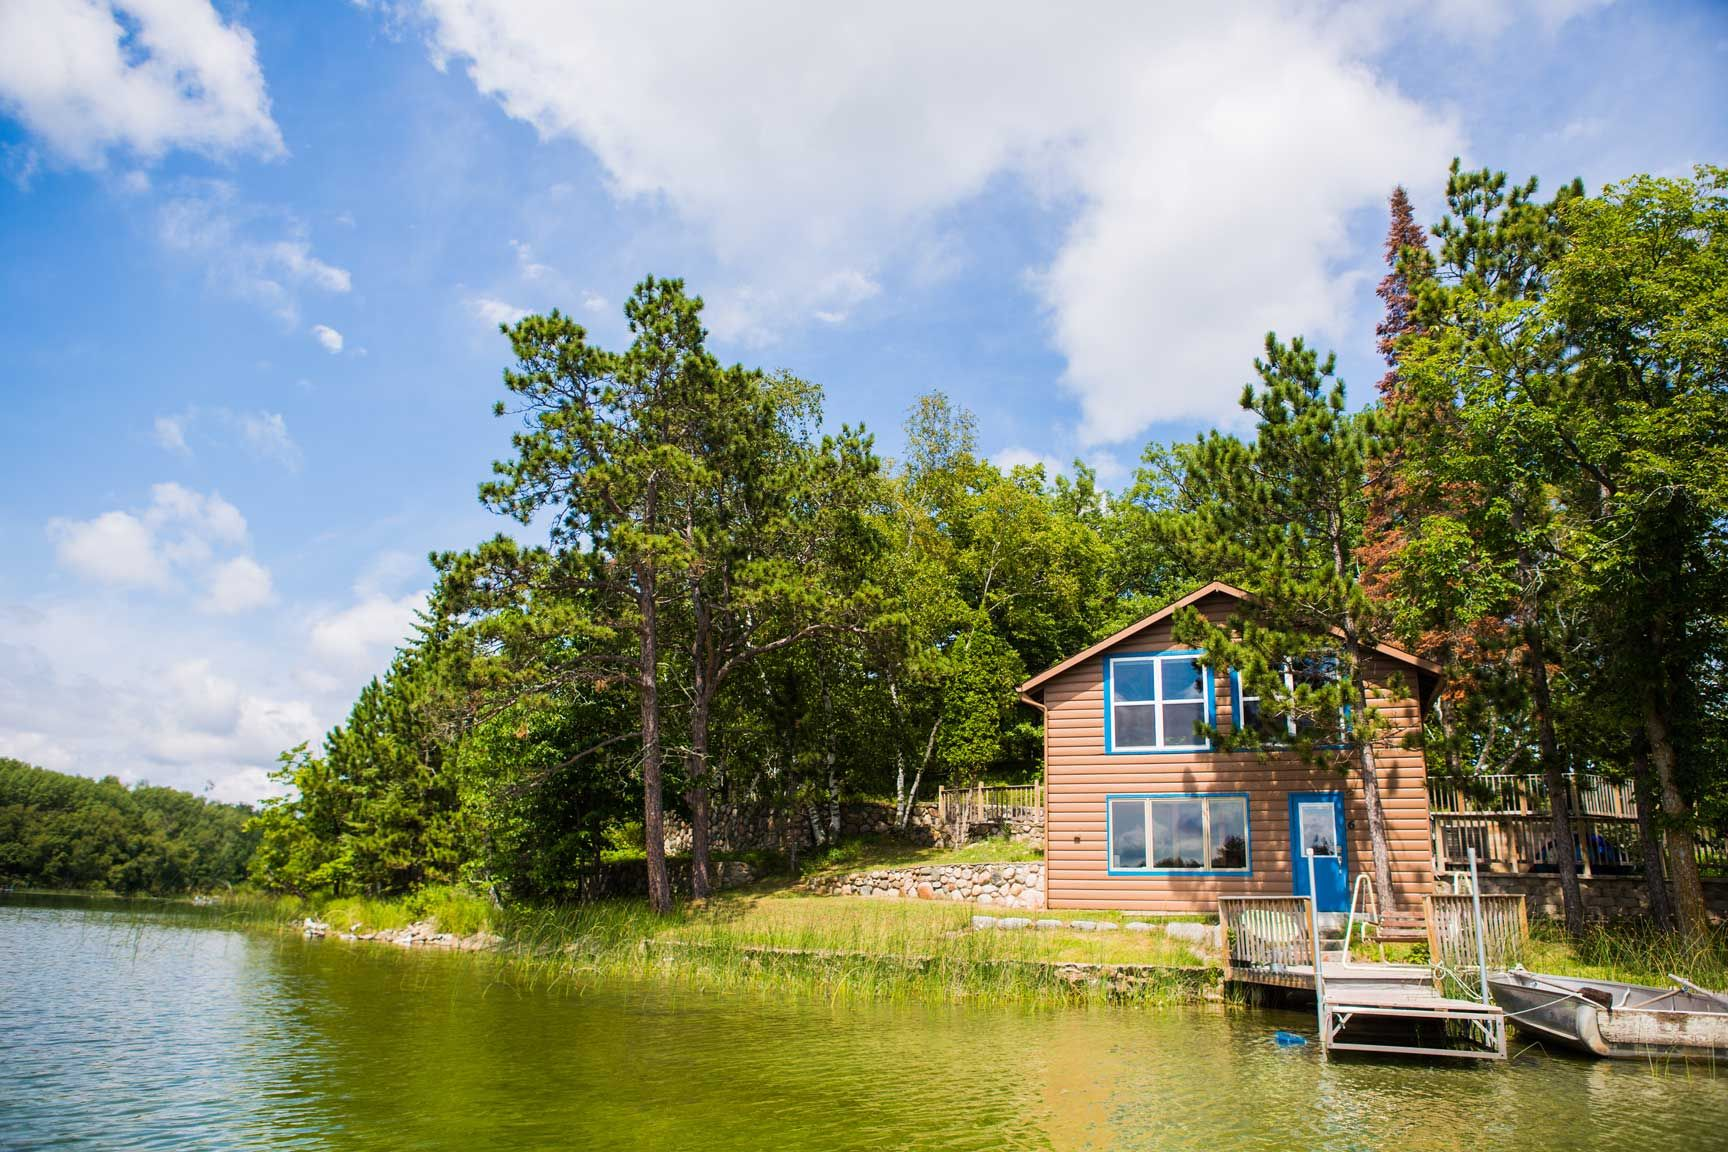 info rentals and interior onlinechange minnesota mn wisconsin brainerd rental to cabins for fishing rent winter cabin sale eapolis in